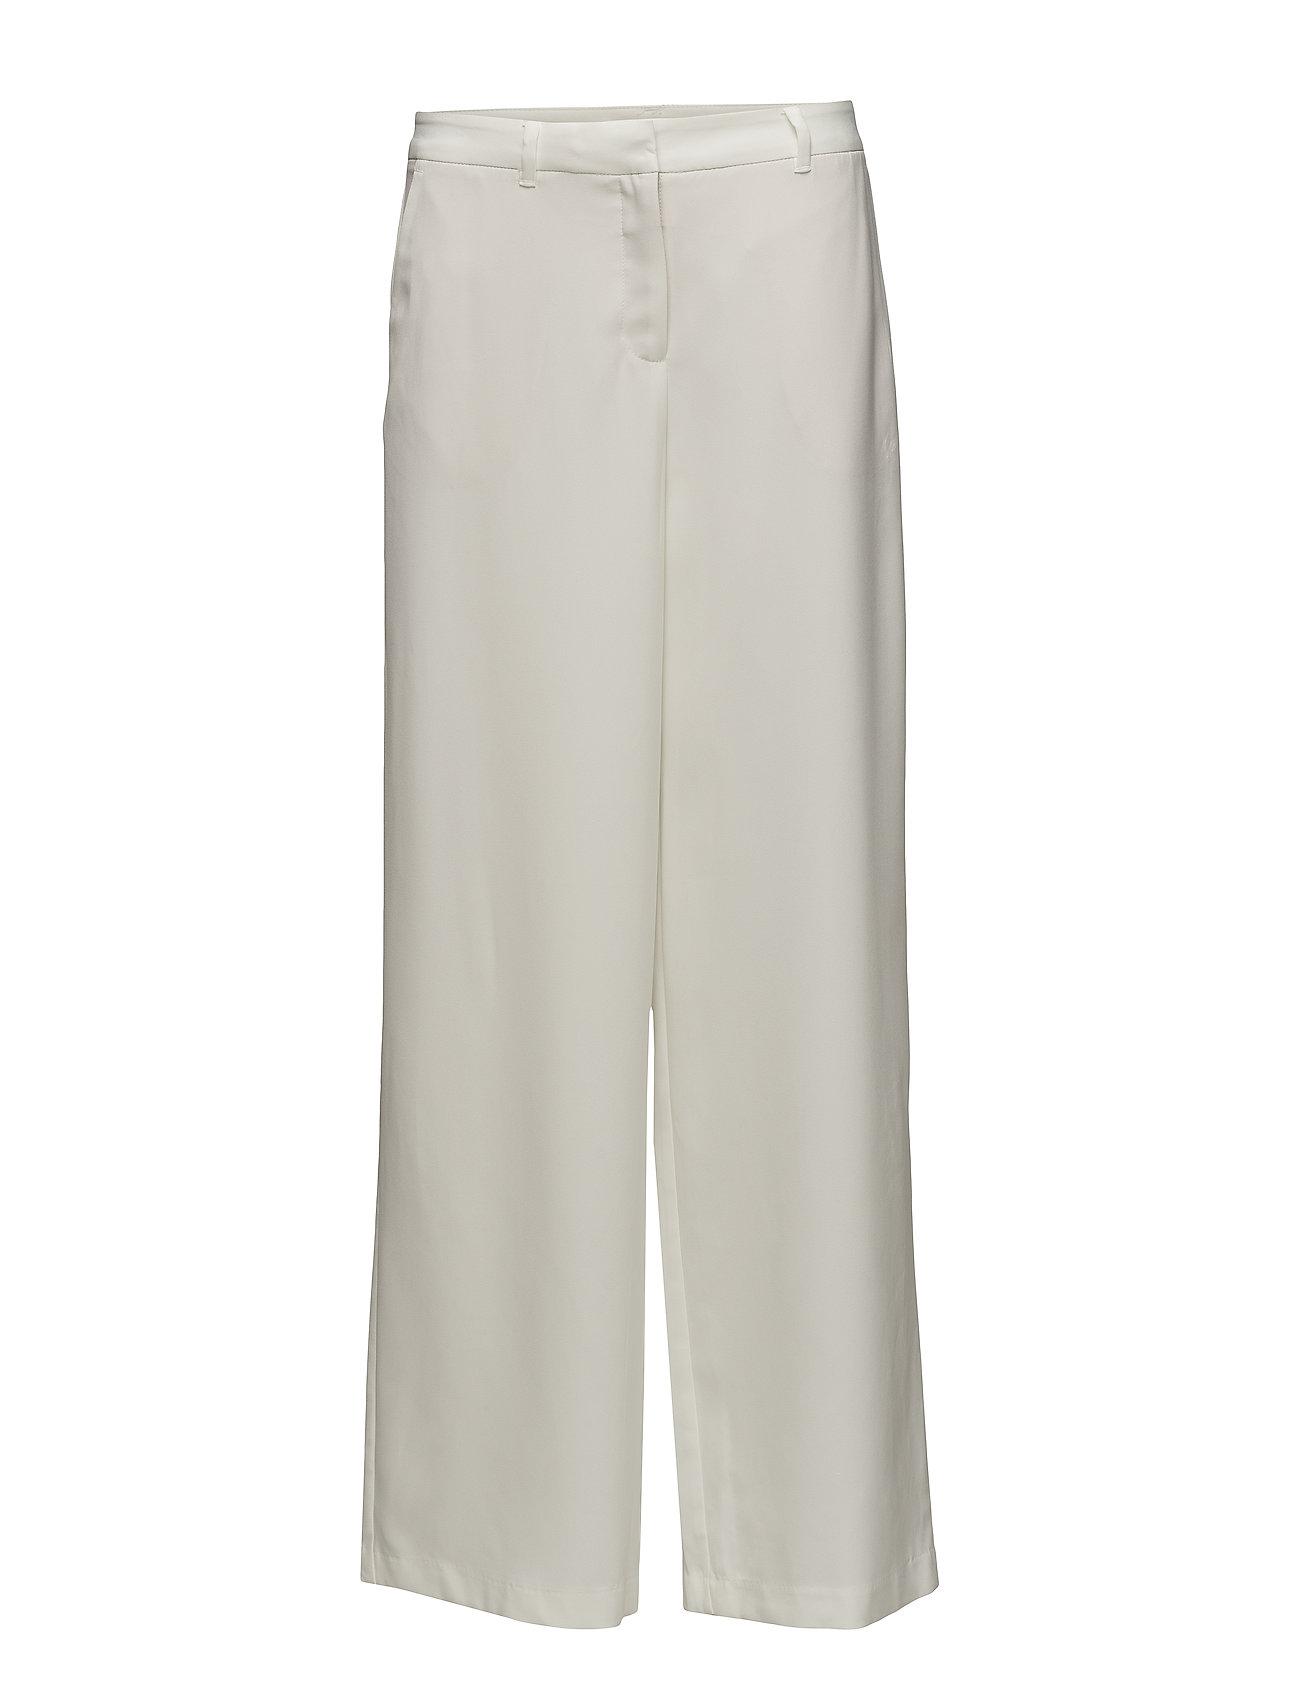 2nd One Eloise 881 White, Pants - WHITE